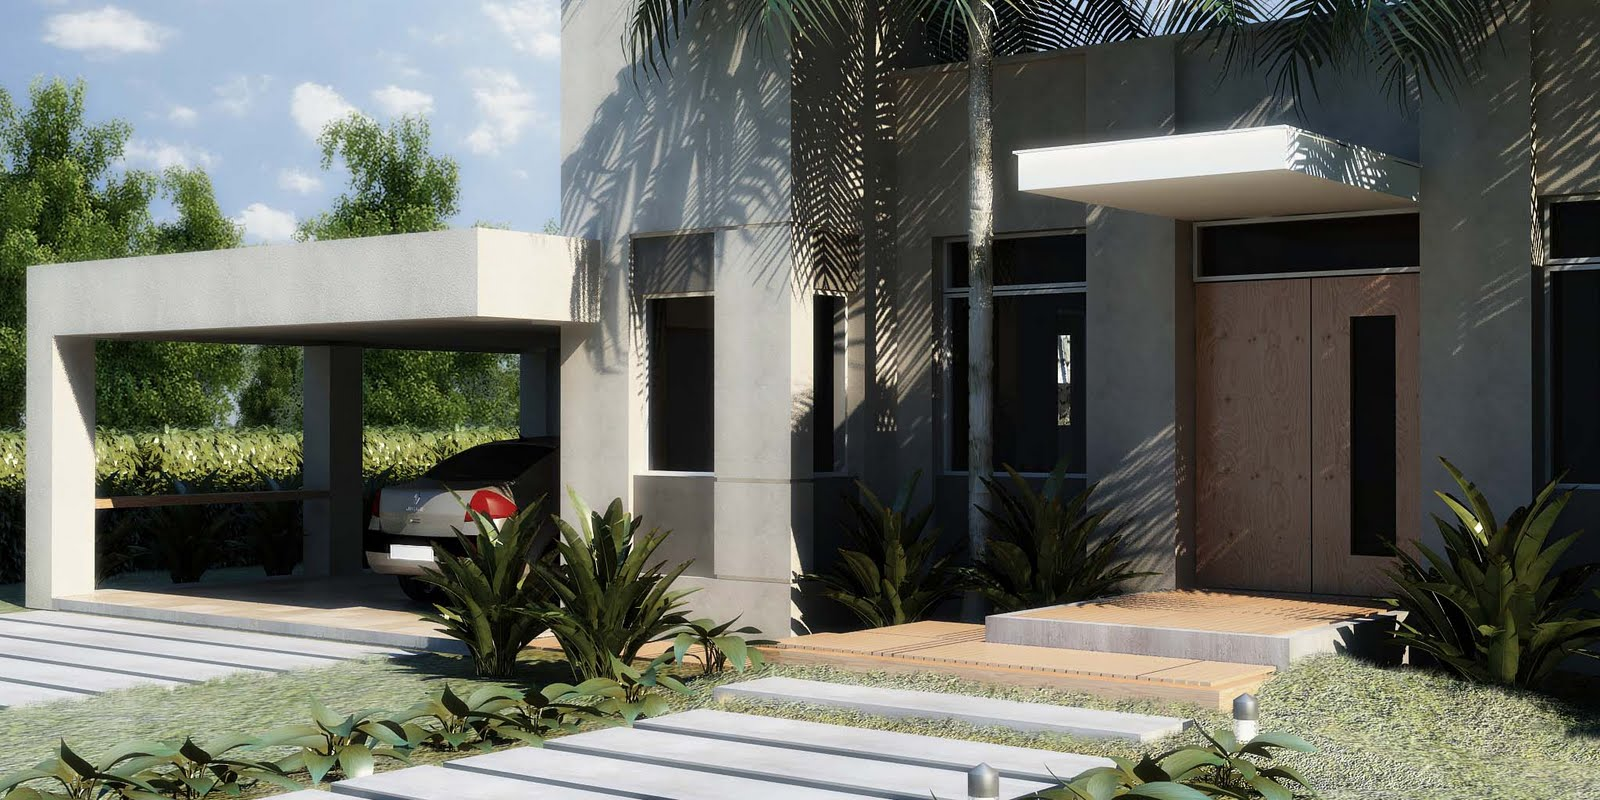 D5max render casas 3d for Casa minimalista definicion